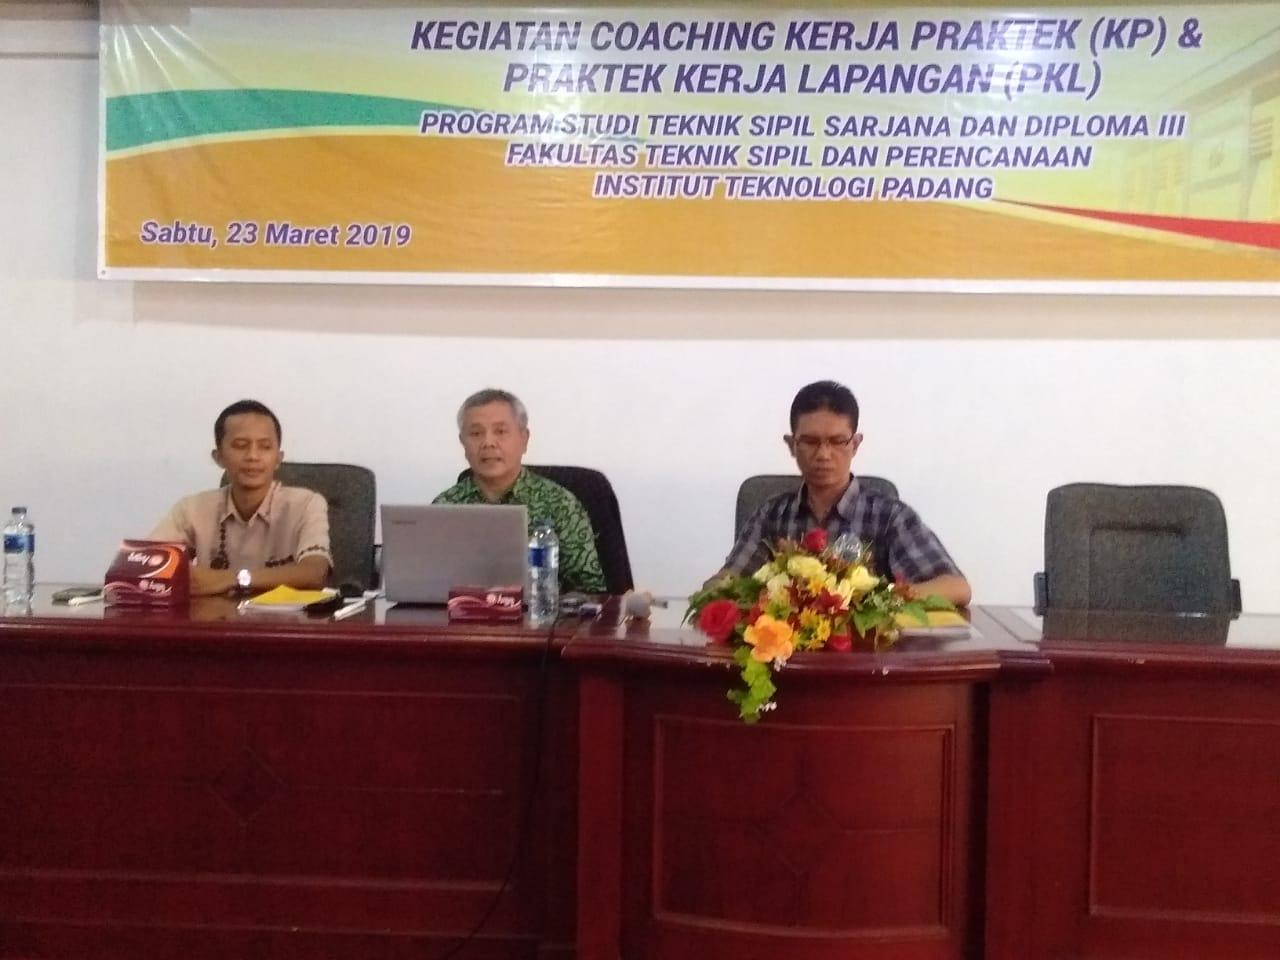 Kegiatan Coaching Praktek Lapangan Semester Genap 2018/2019 Jurusan Teknik Sipil S1